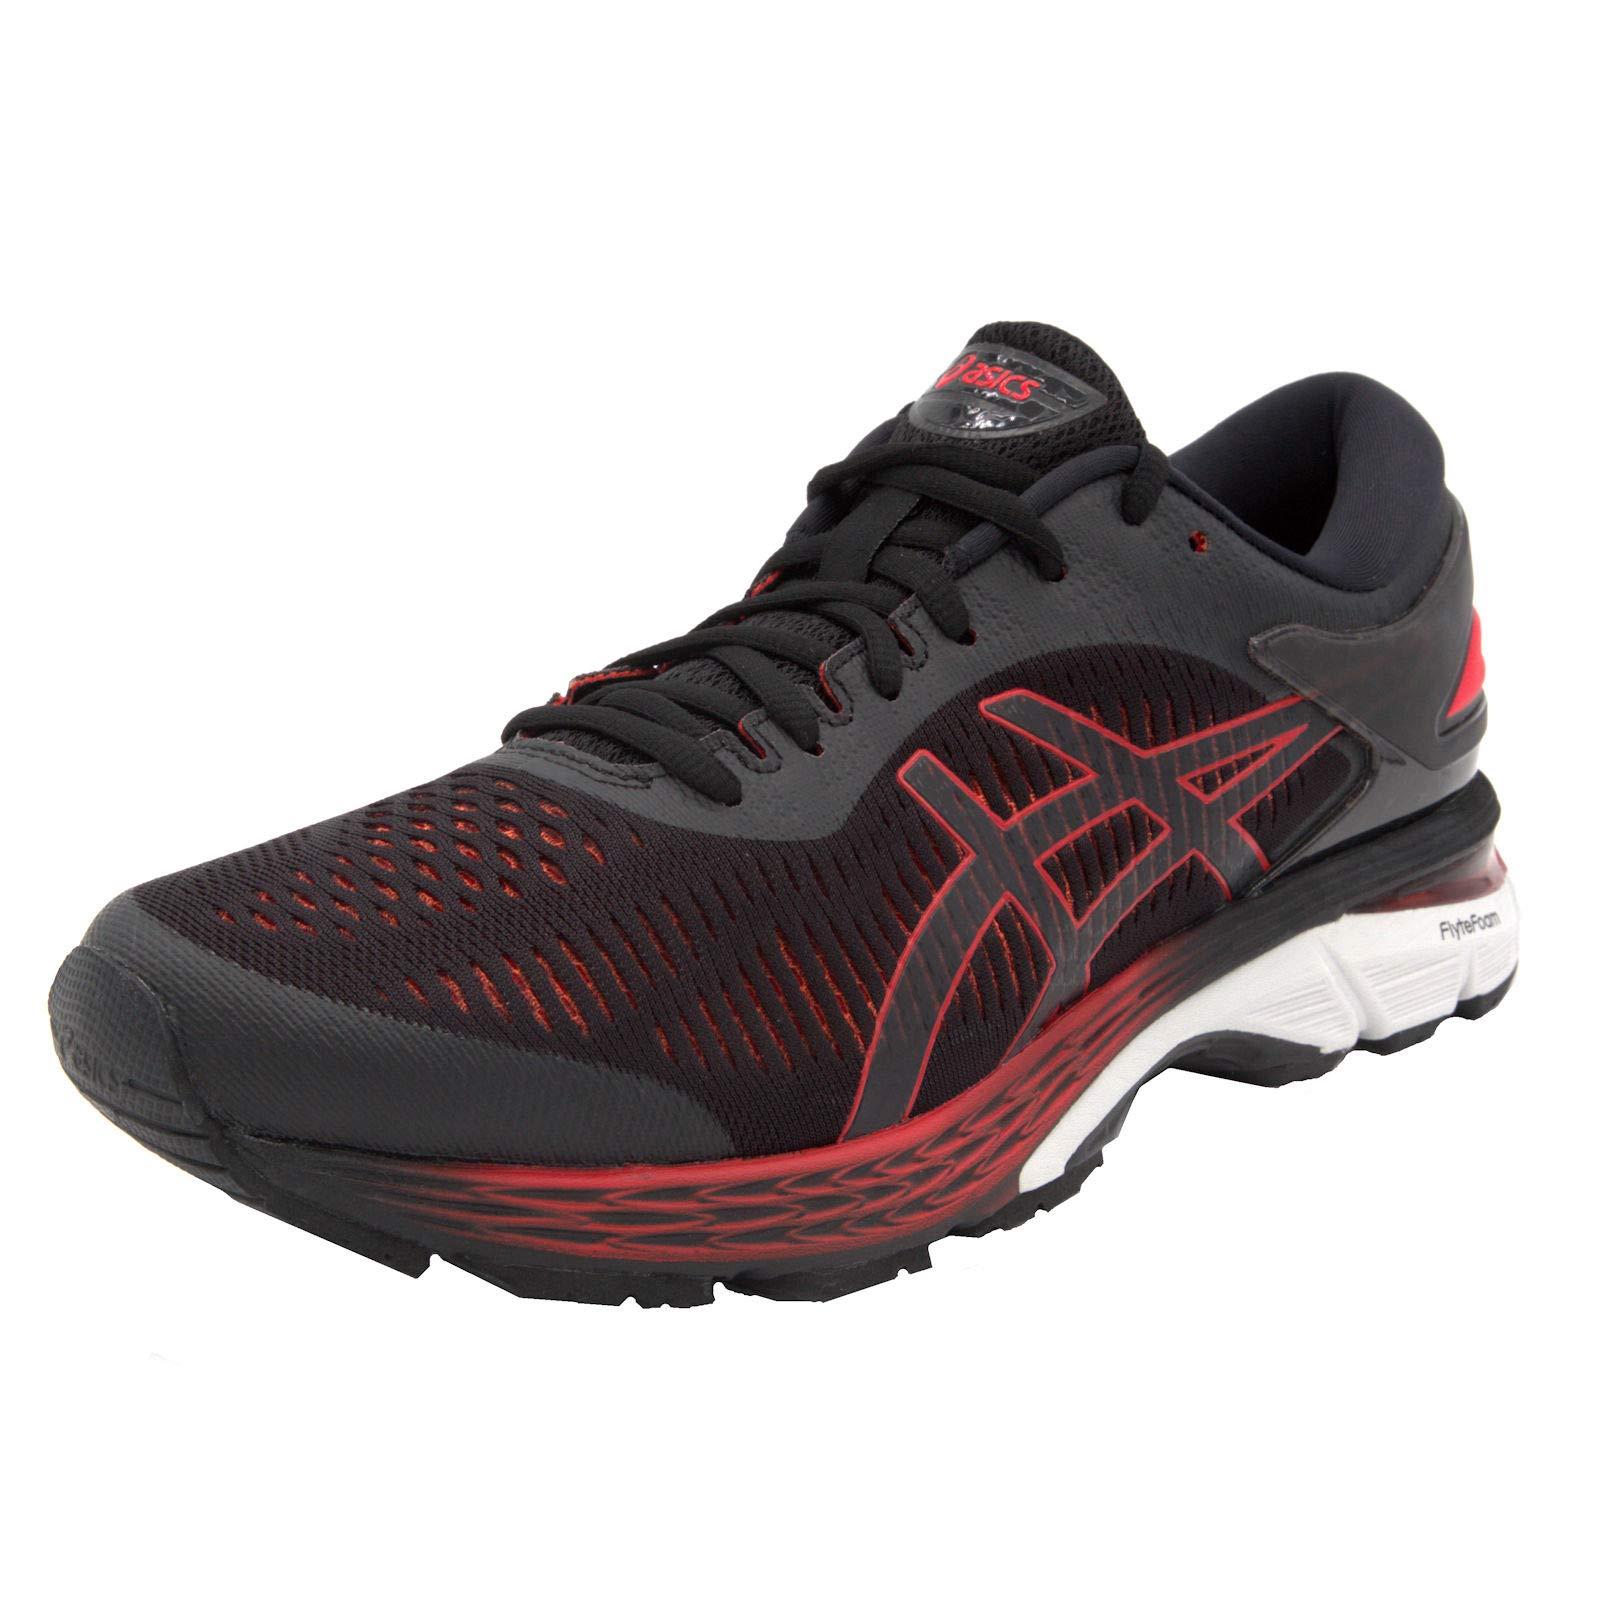 Asics Gel-Kayano 25, Zapatillas de Running para Hombre product image